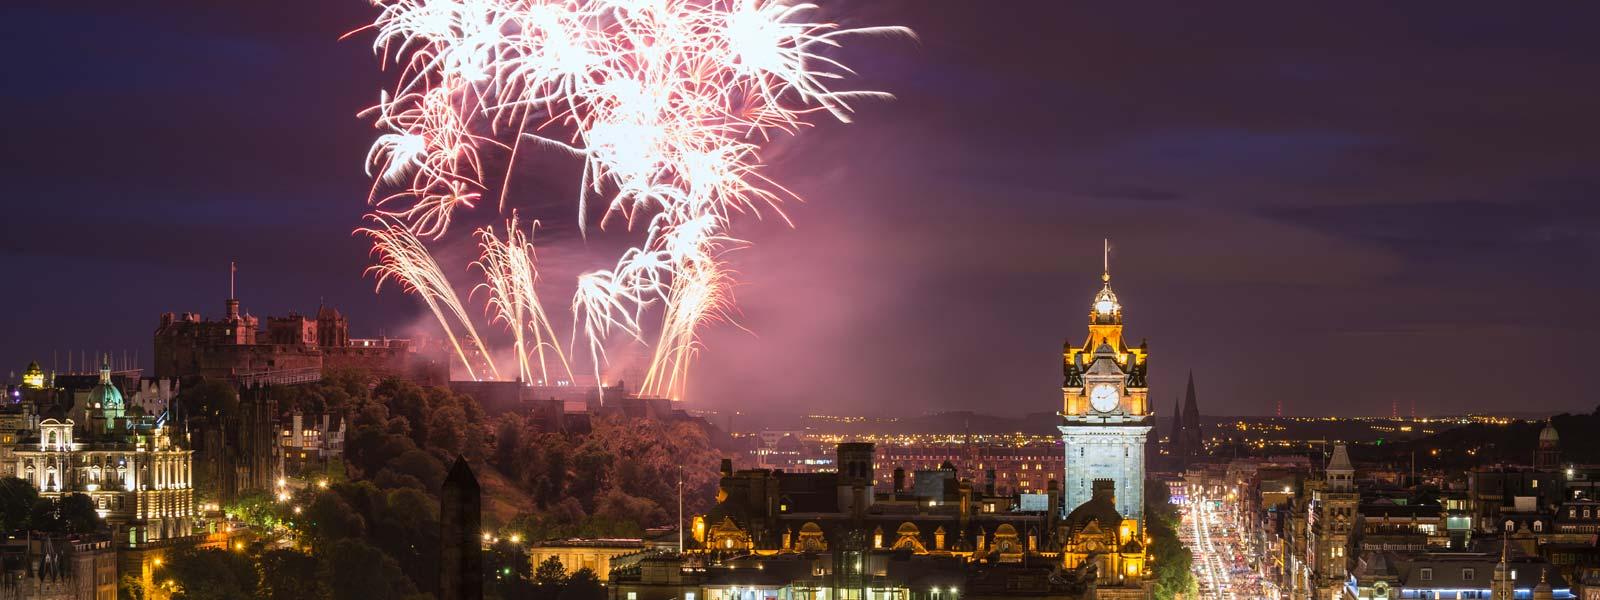 Hogmanay Fireworks in Edinburgh